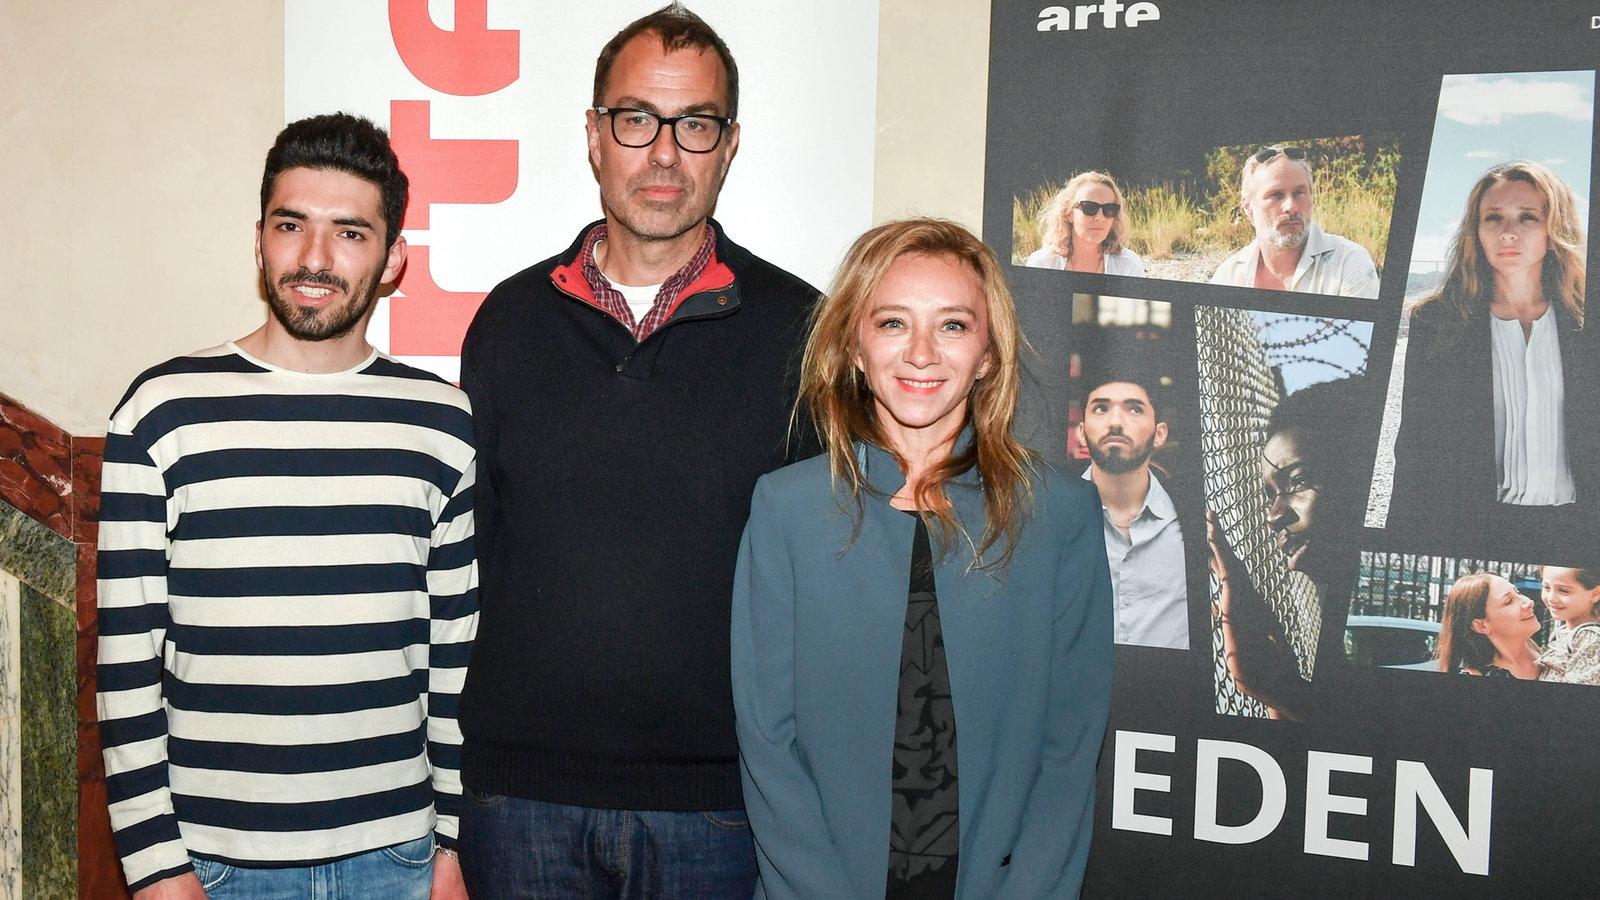 Adnan Jafar, Dominik Moll und Sylvie Testud vor dem Filmplakat Eden